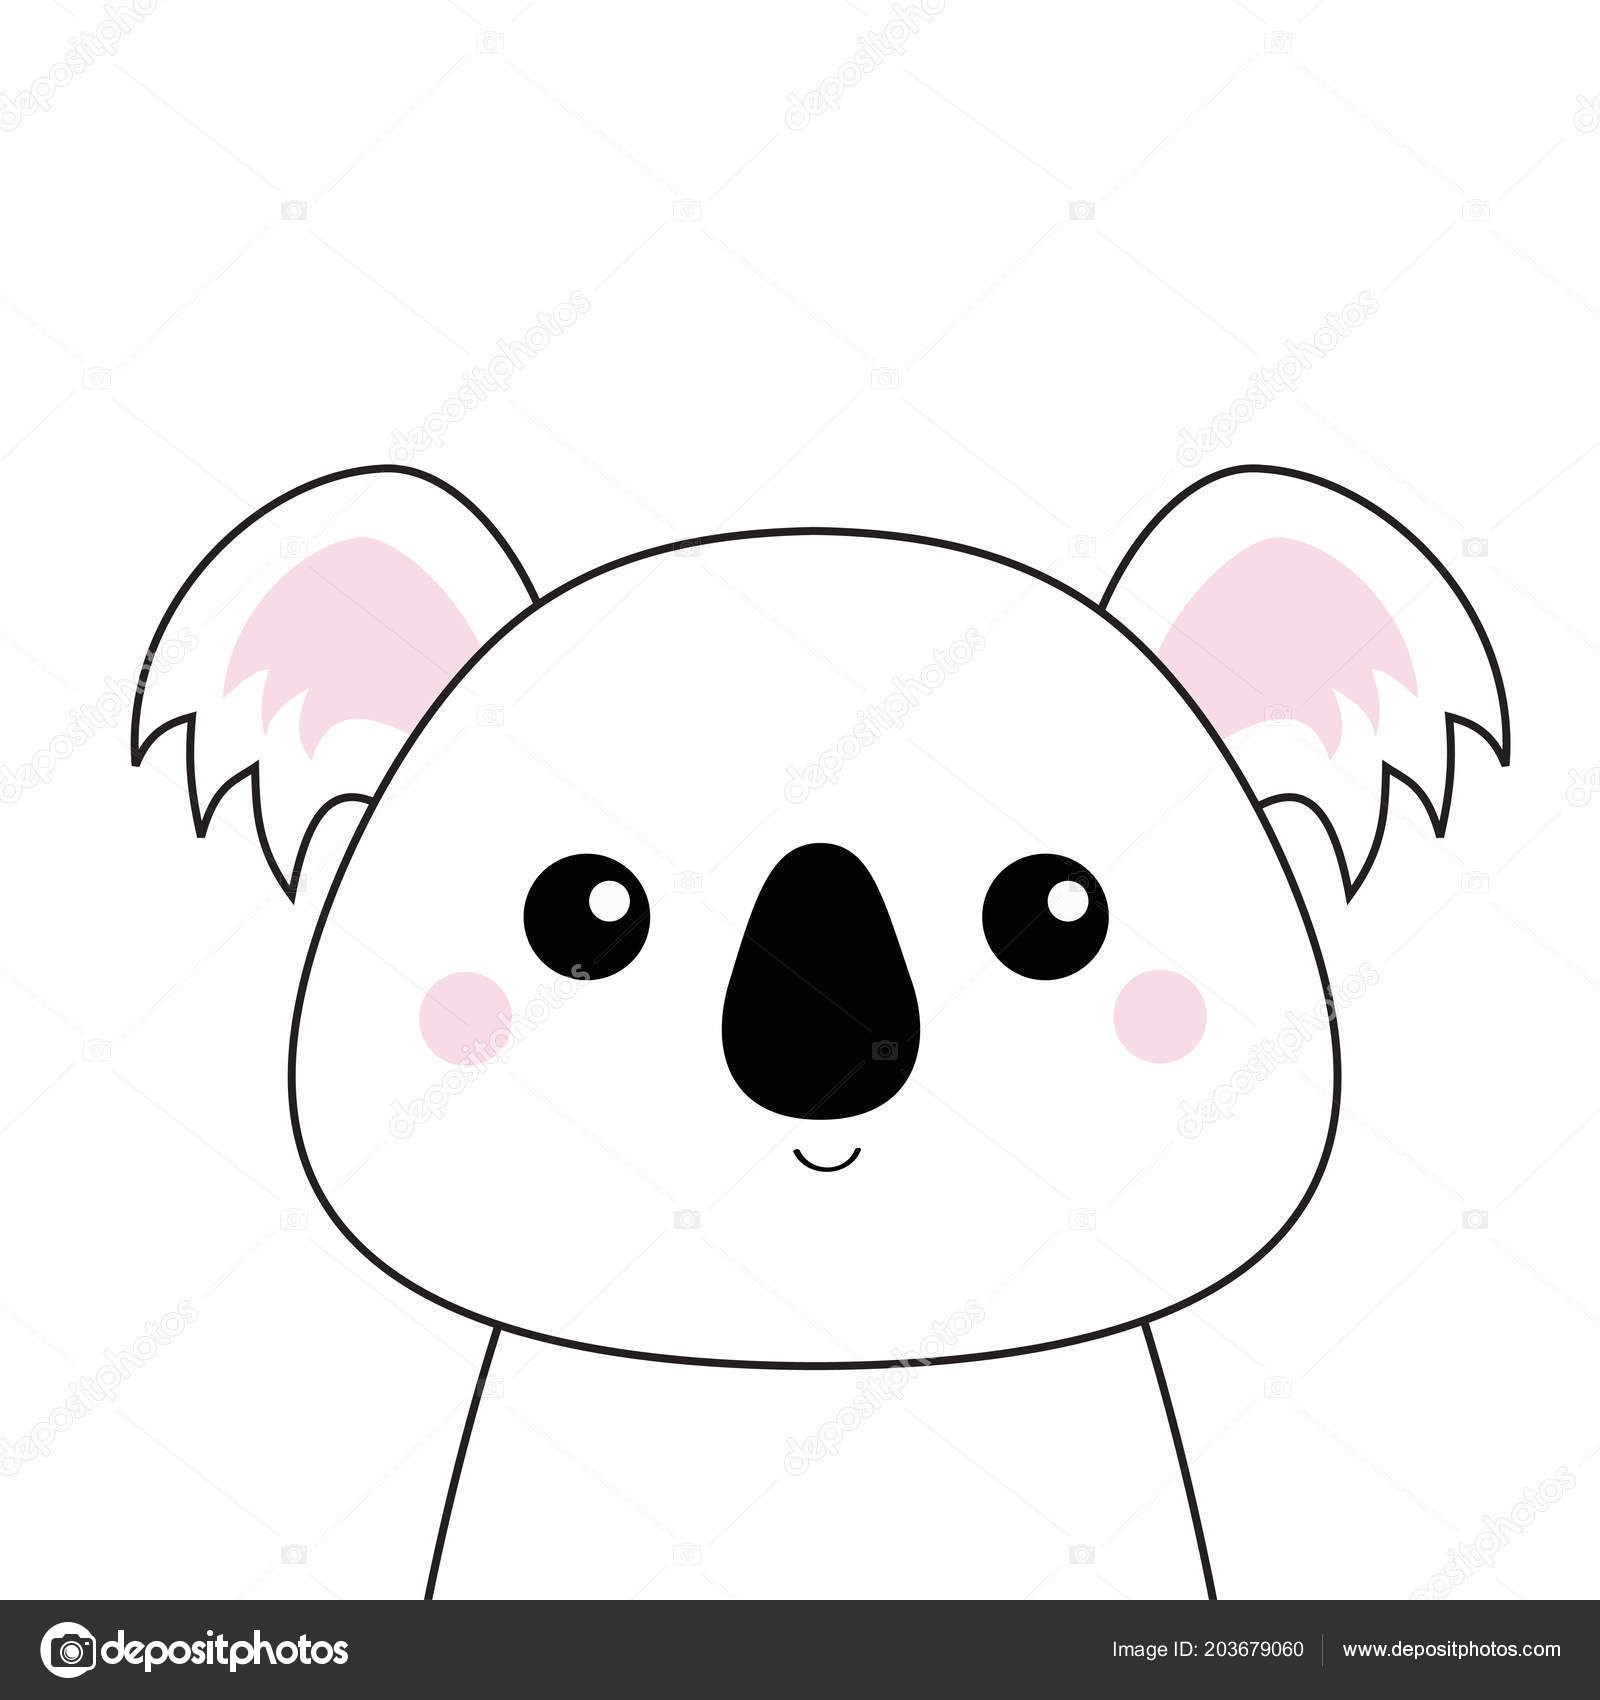 Koala Blanc Visage Silhouette Contour Noir Kawaii Animal Personnage